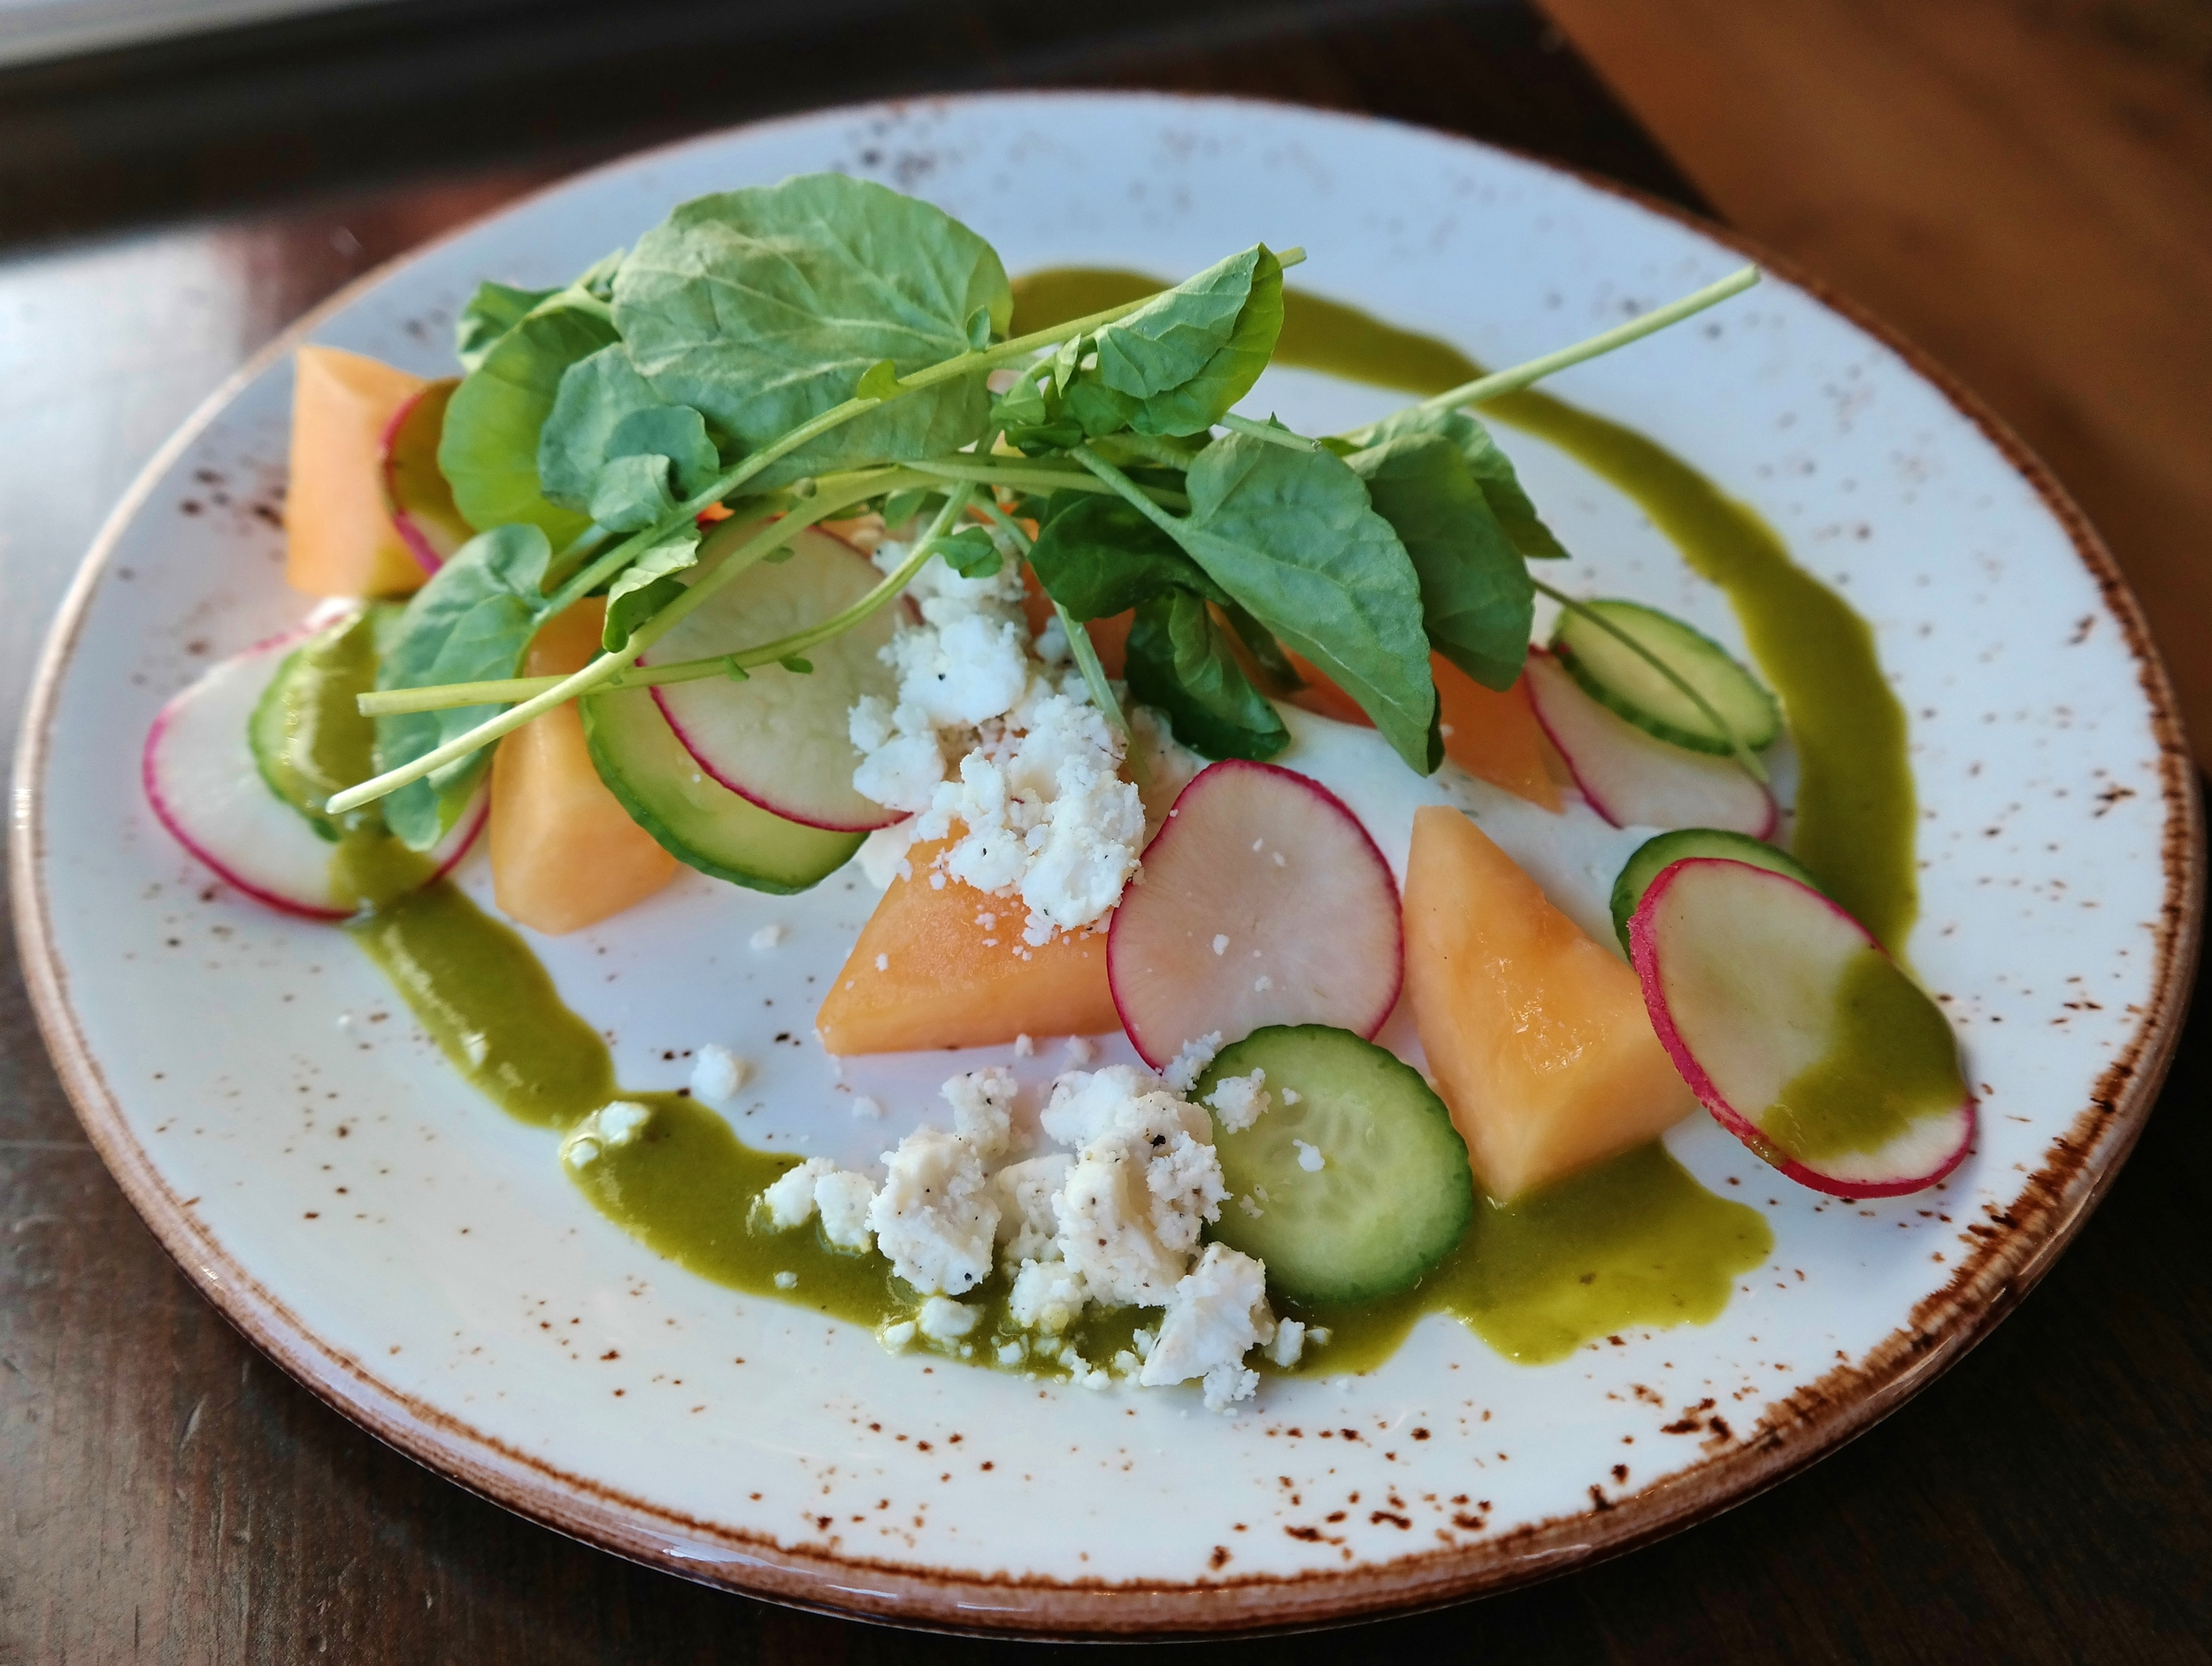 AZ Summer Salad with boursin, cucumber, melon, radish and feta